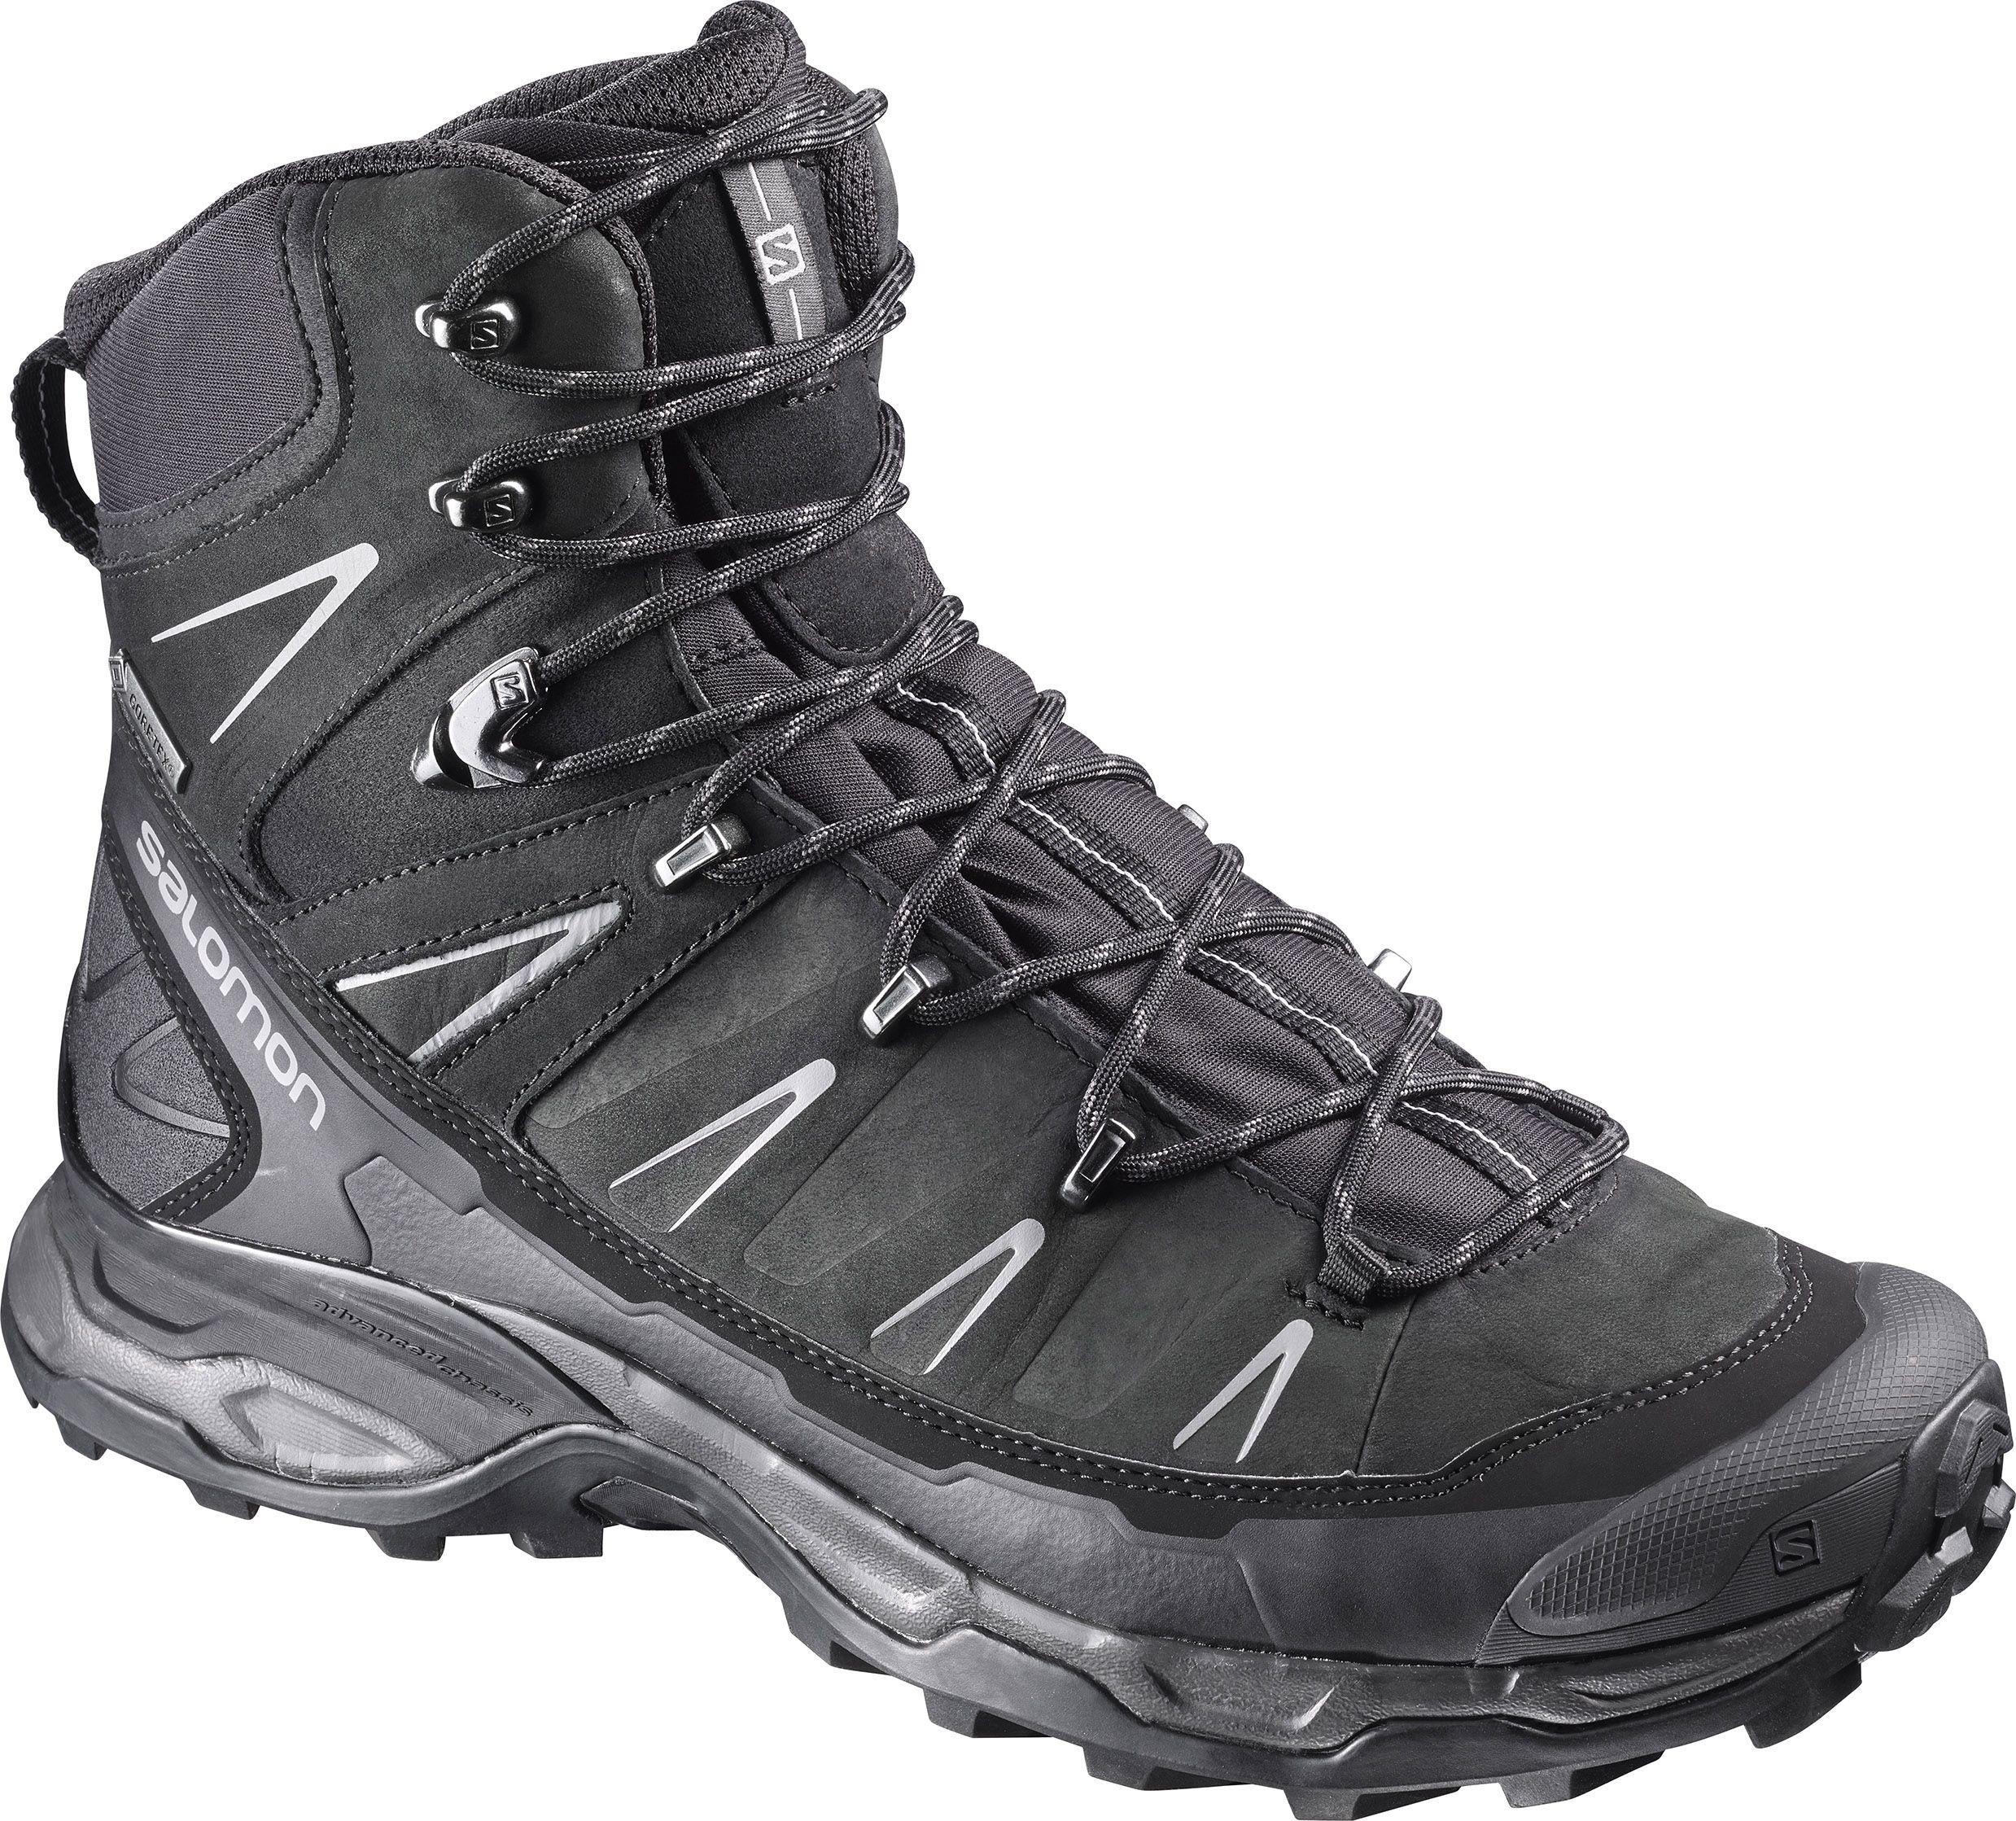 Buty Salomon X Ultra Trek Gtx Black Best Hiking Boots Backpacking Boots Walking Boots